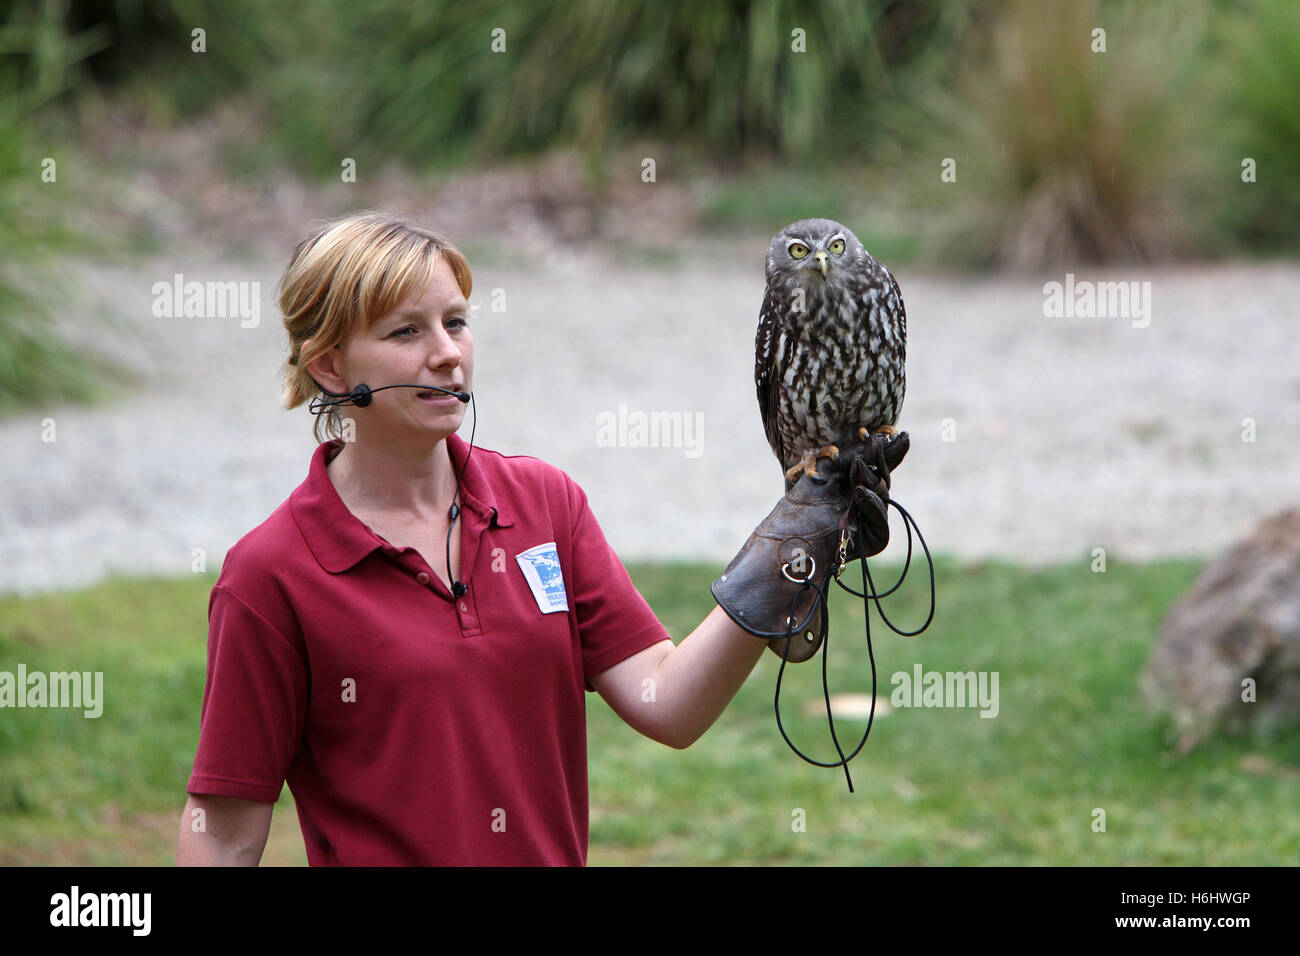 Birds Of Prey Show At Healesville Sanctuary Victoria Australia Stock Photo Alamy